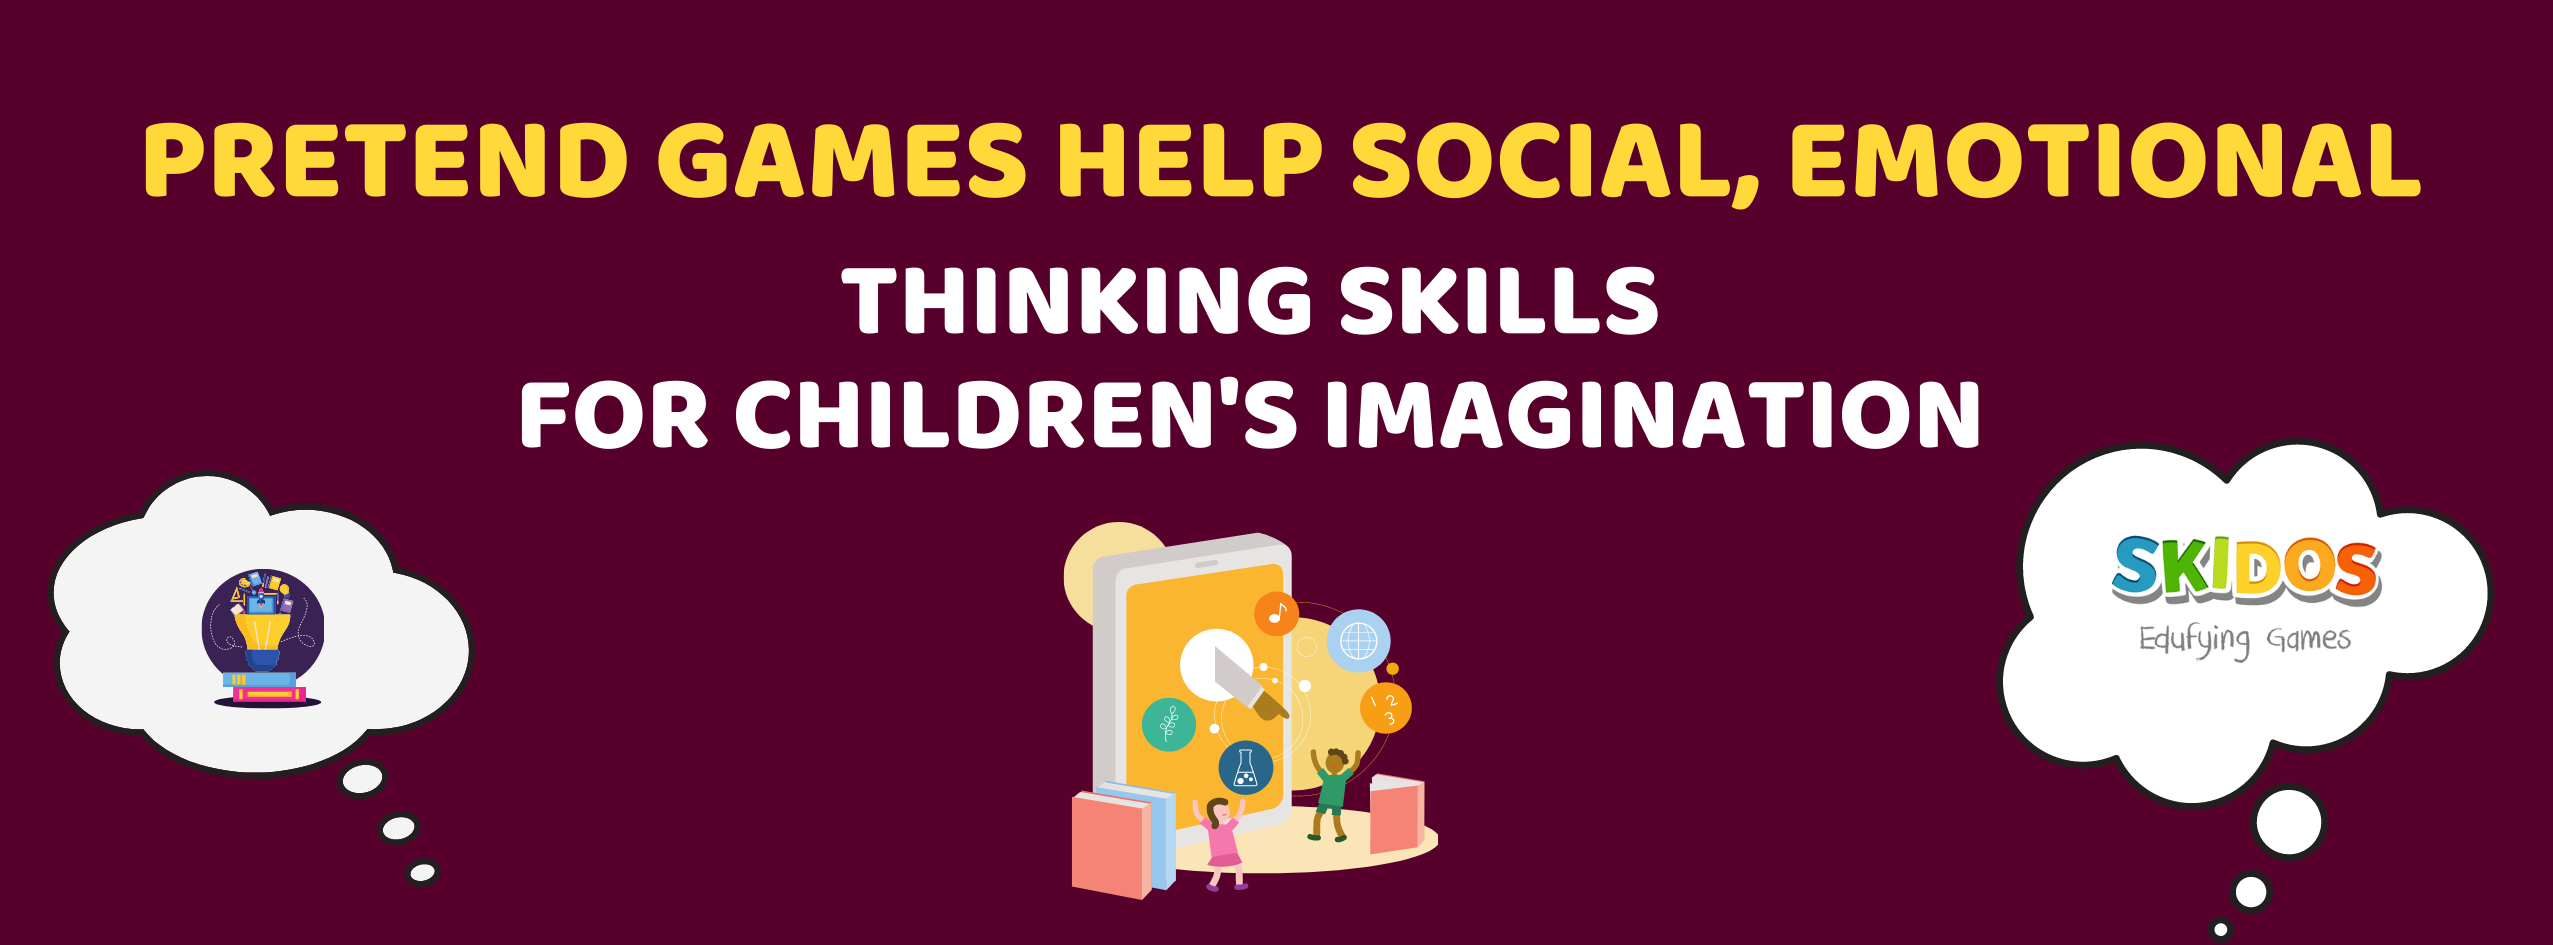 online learning games for kids imagination